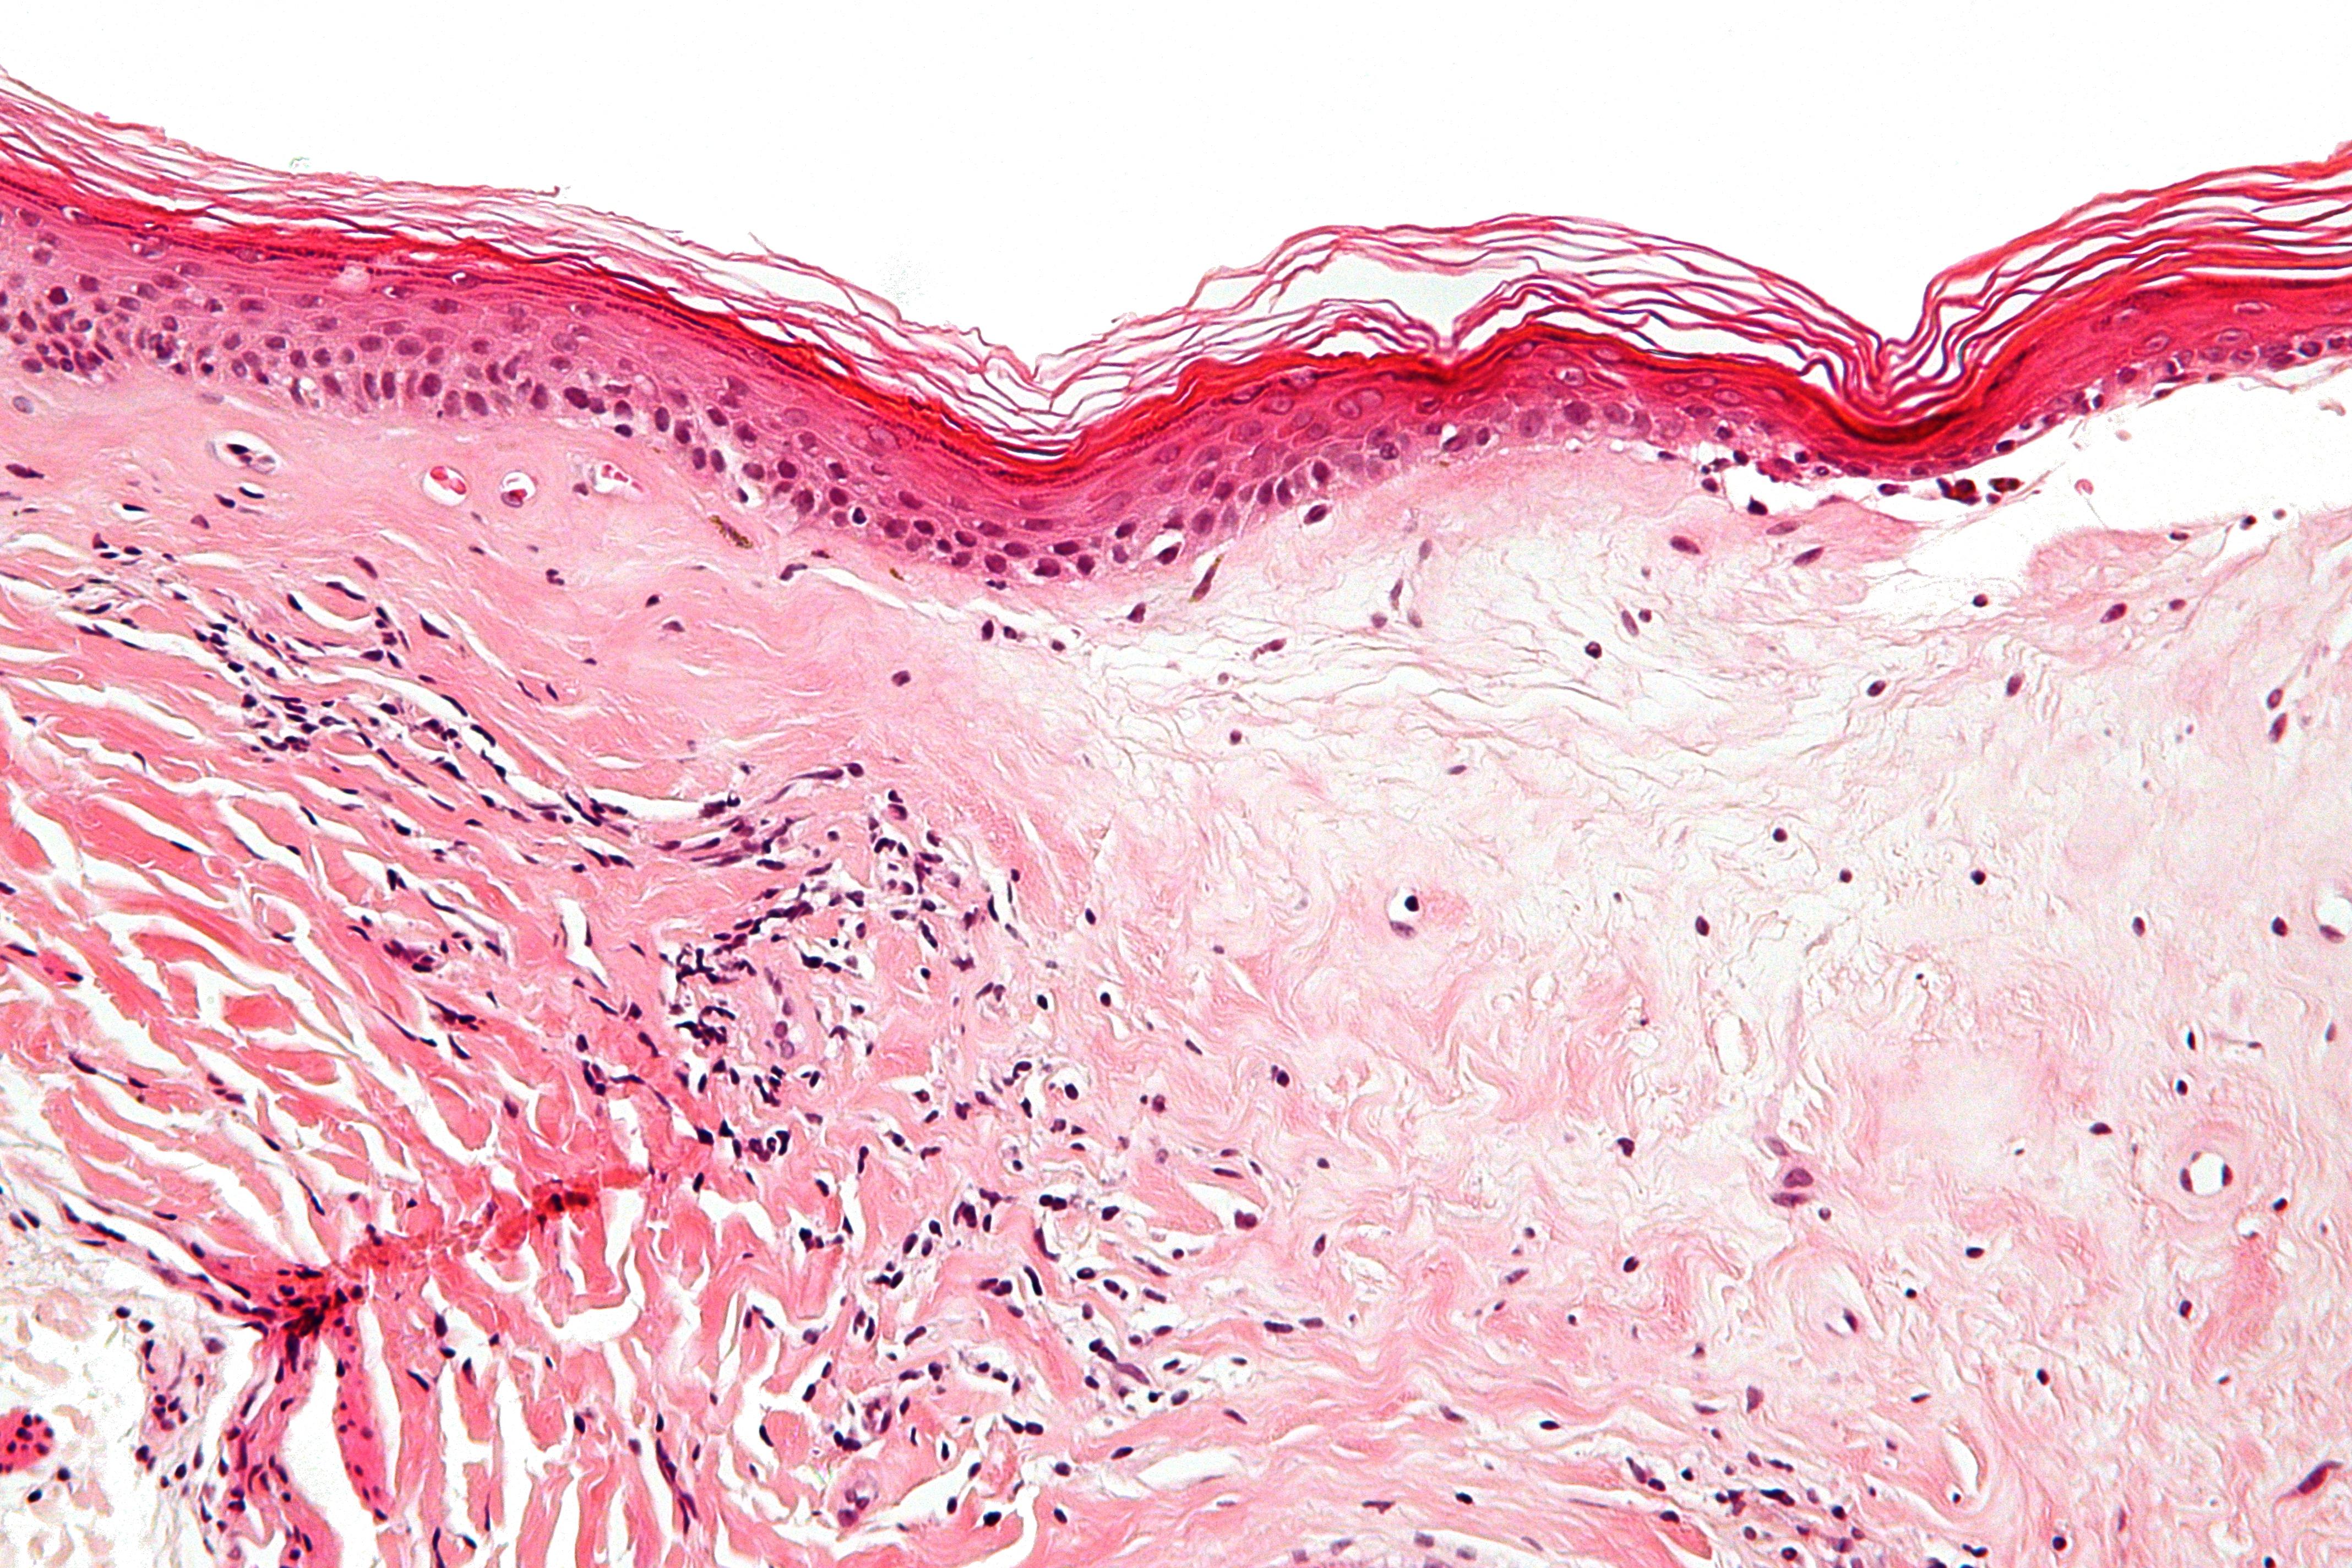 Confluent reticulated papillomatosis dermnet - Varicele reticular că